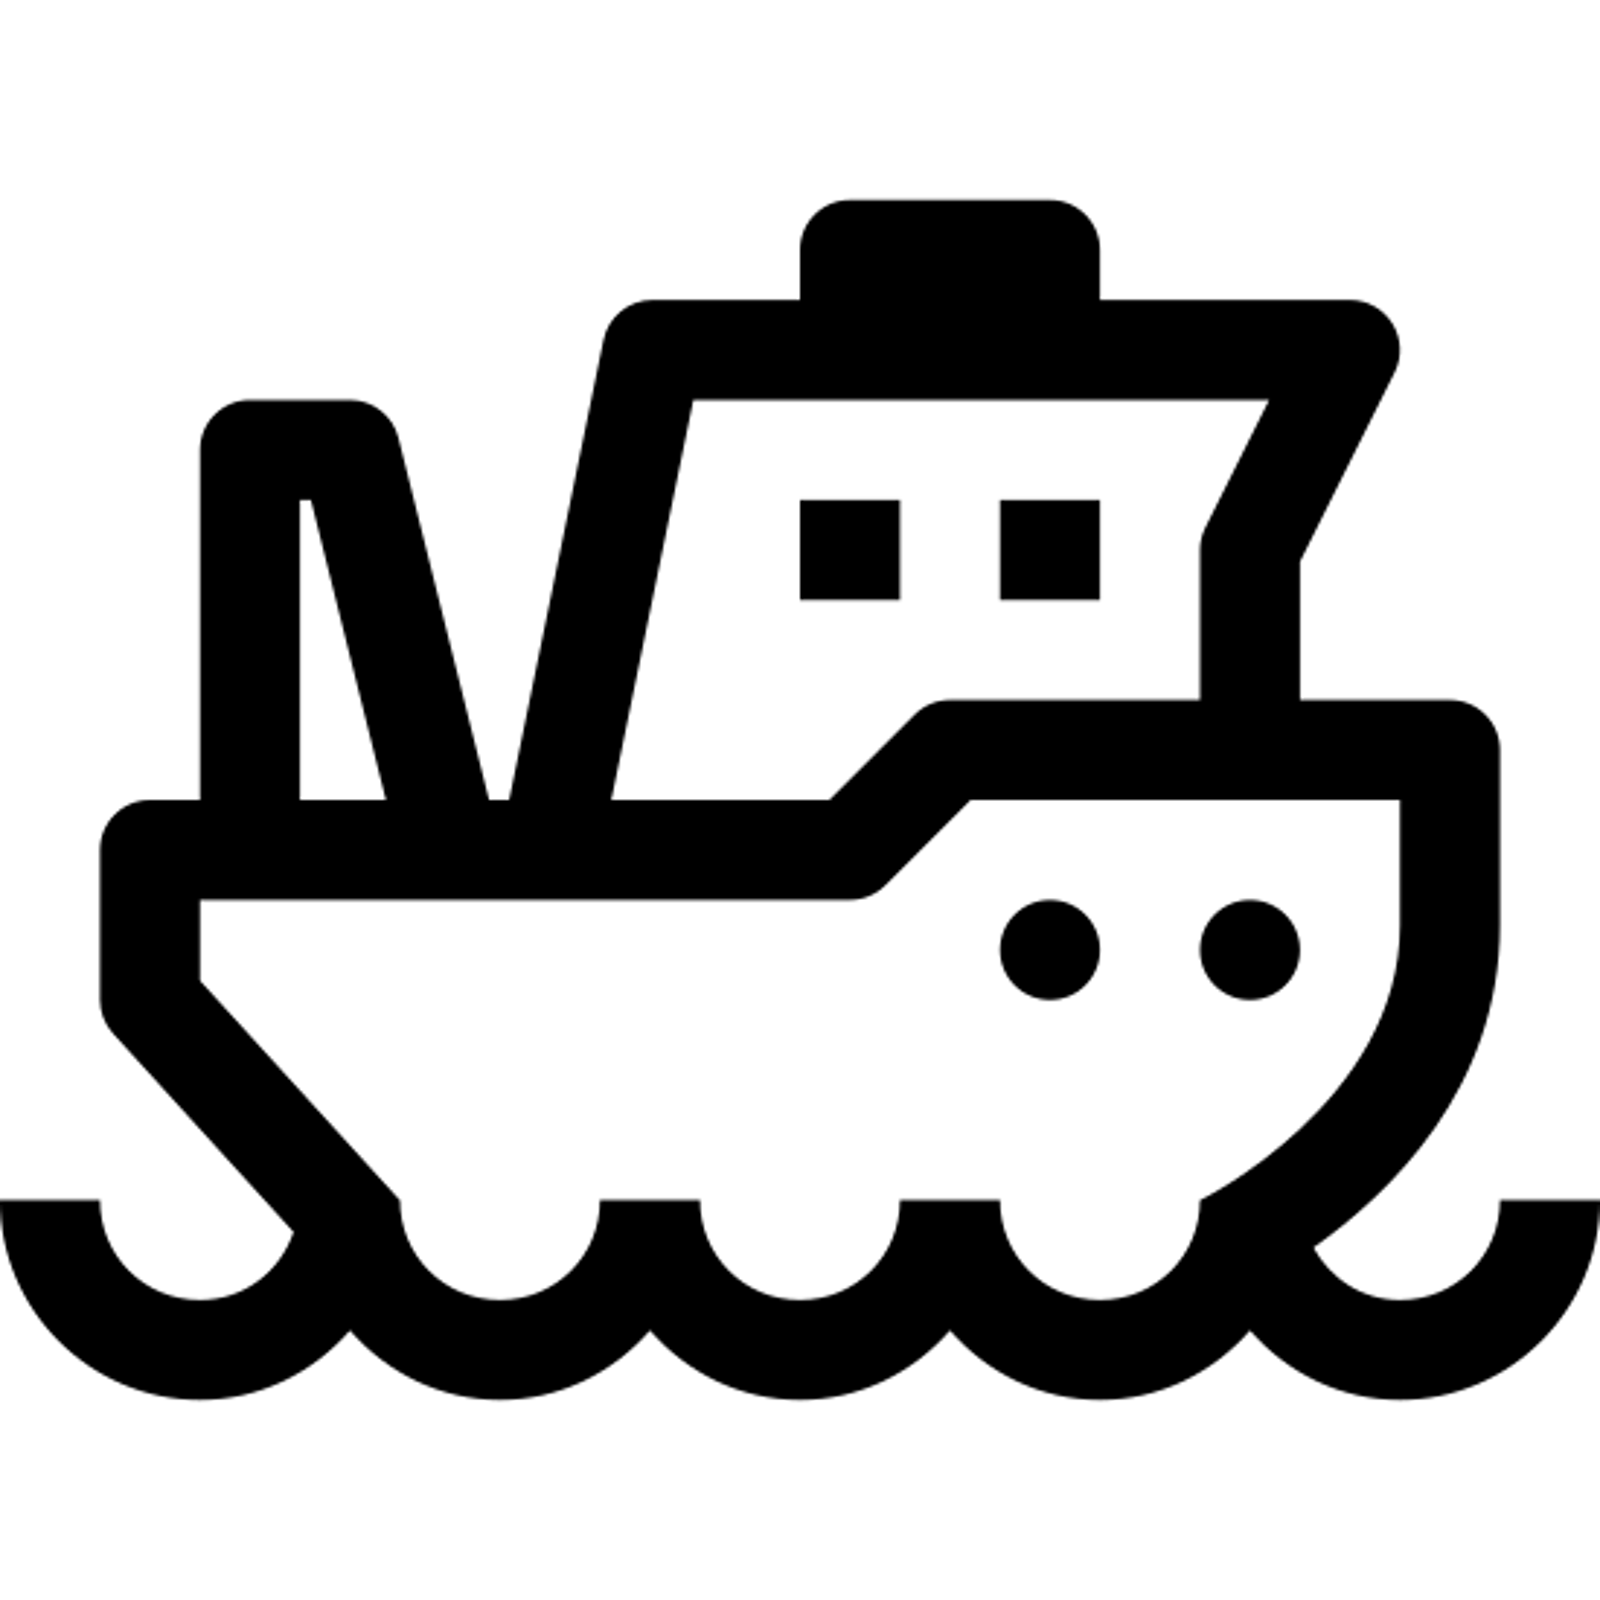 Łódź rybacka icon